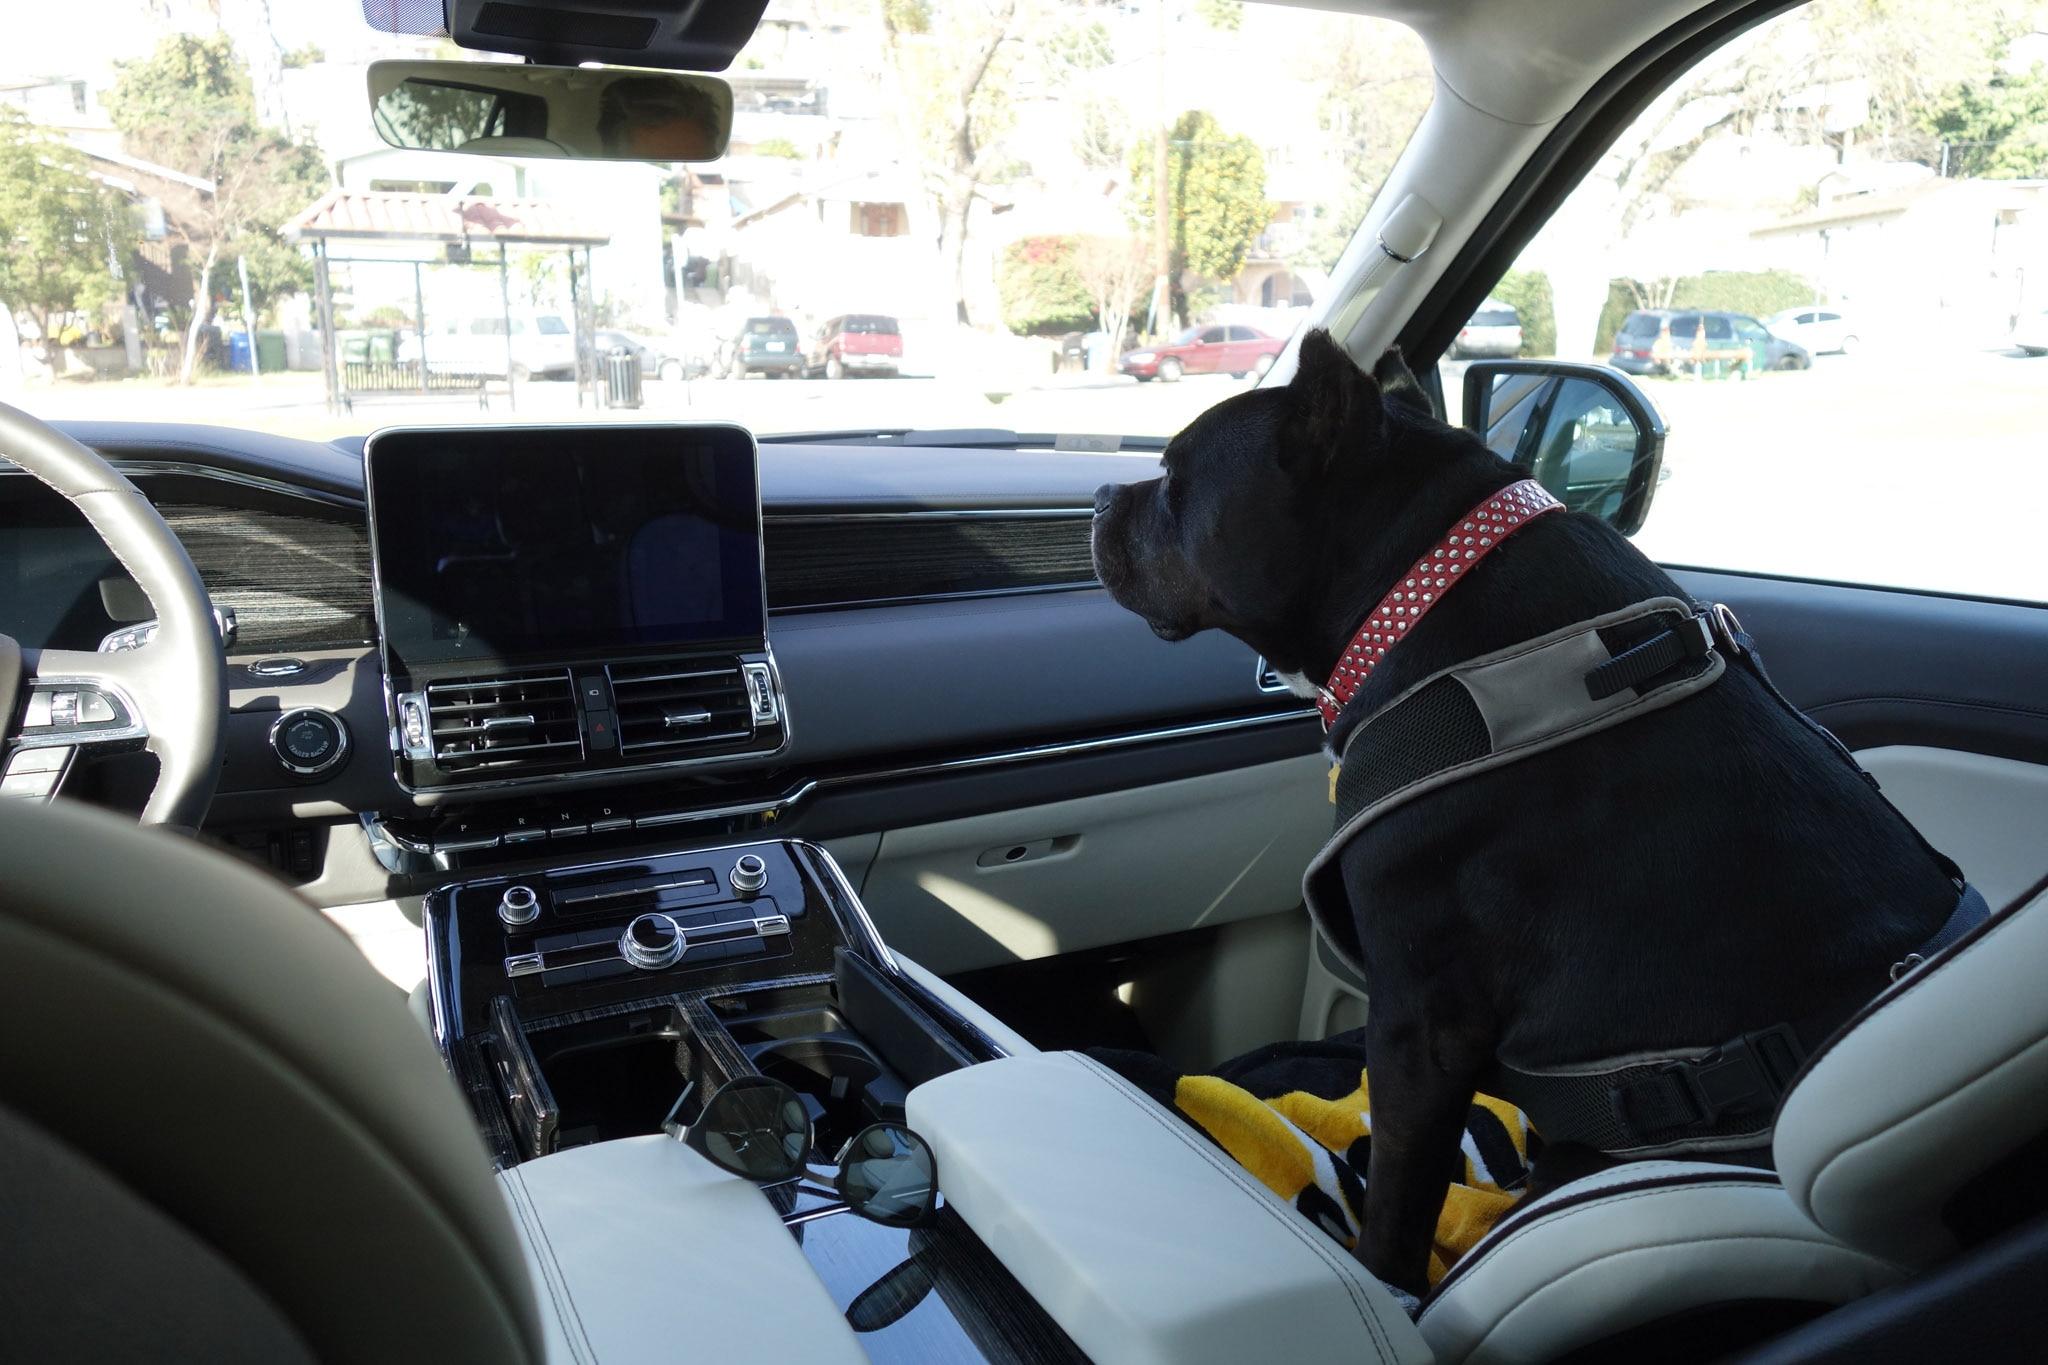 2018 Lincoln Navigator 4x4 Black Label Edition Quick Take Review